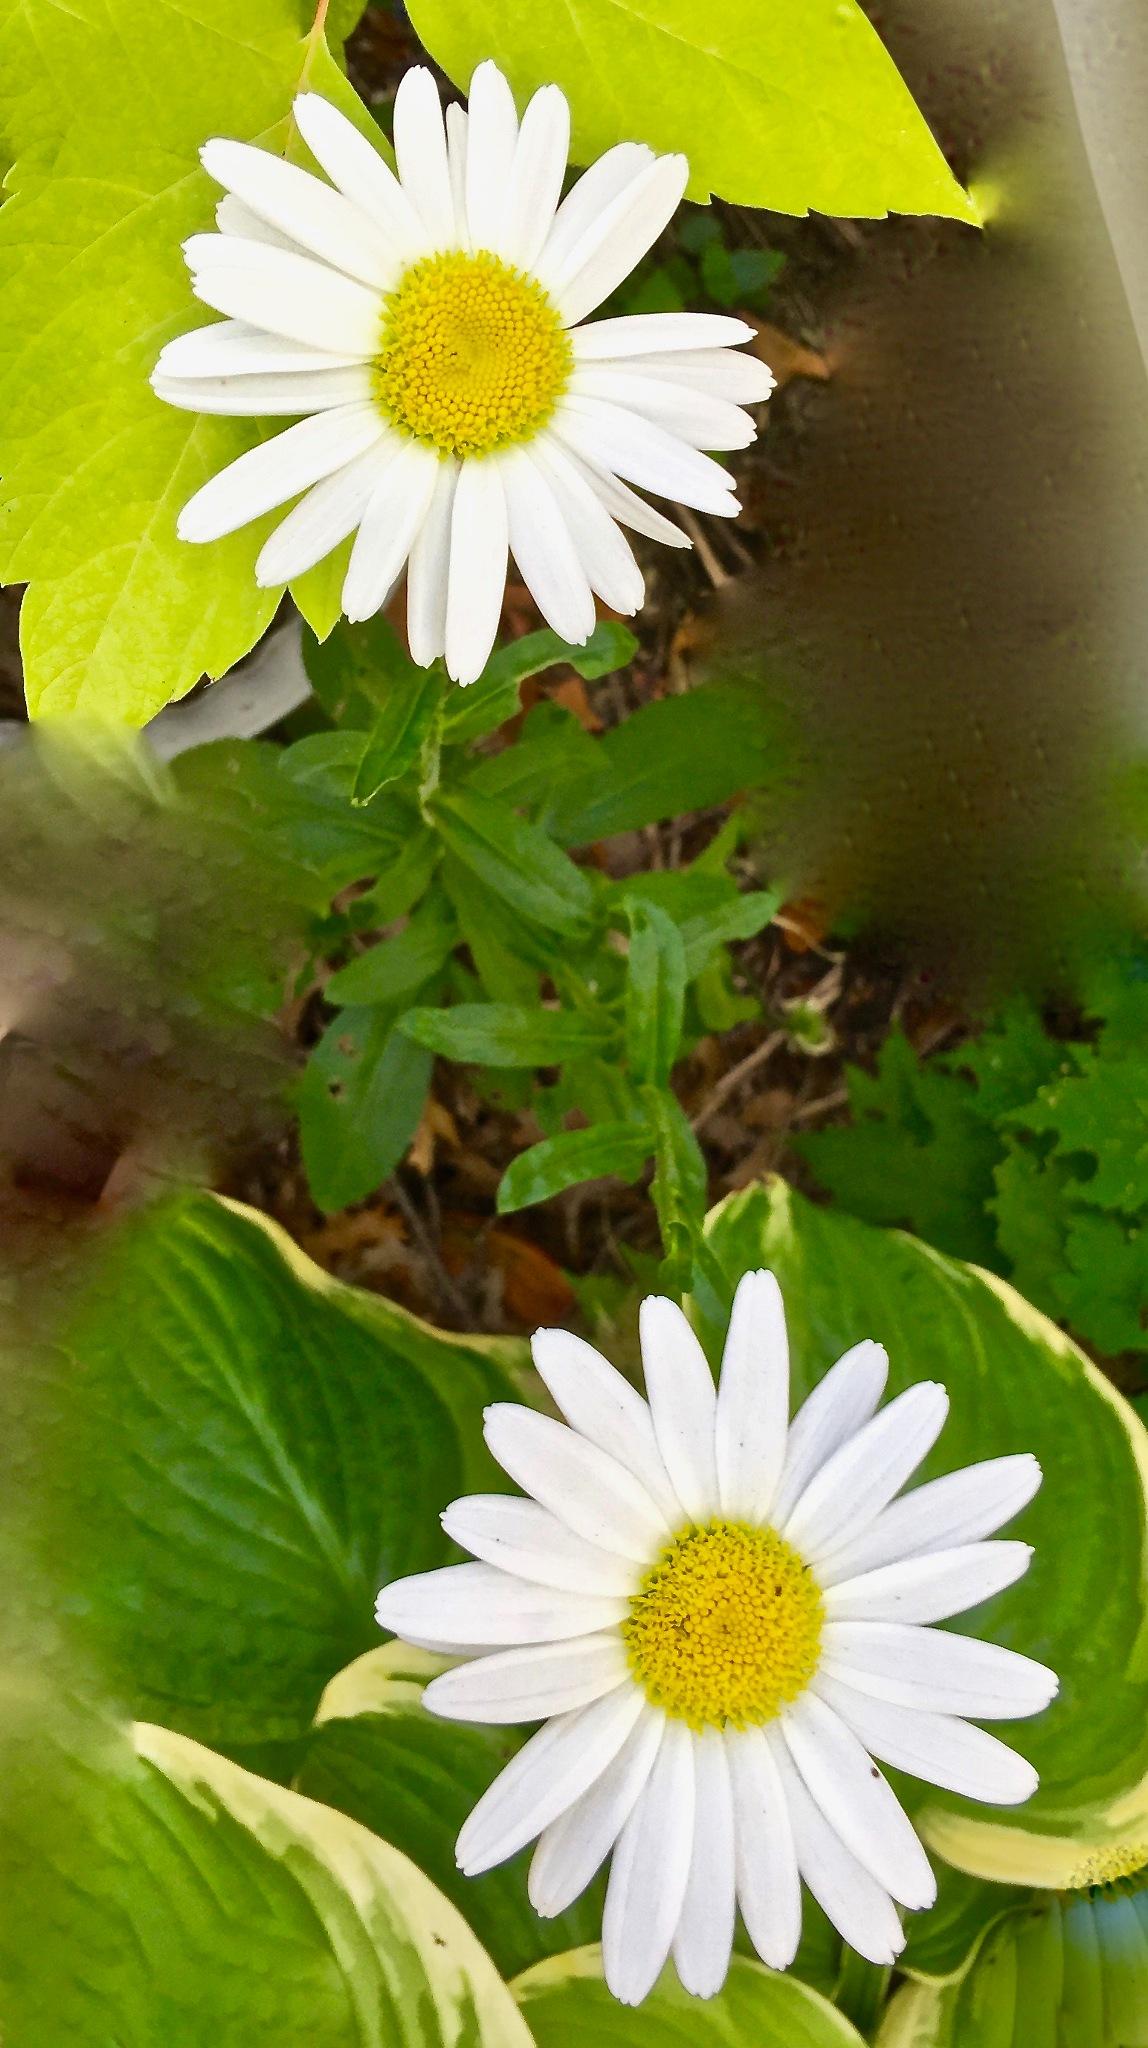 Daisy by LauraAnn